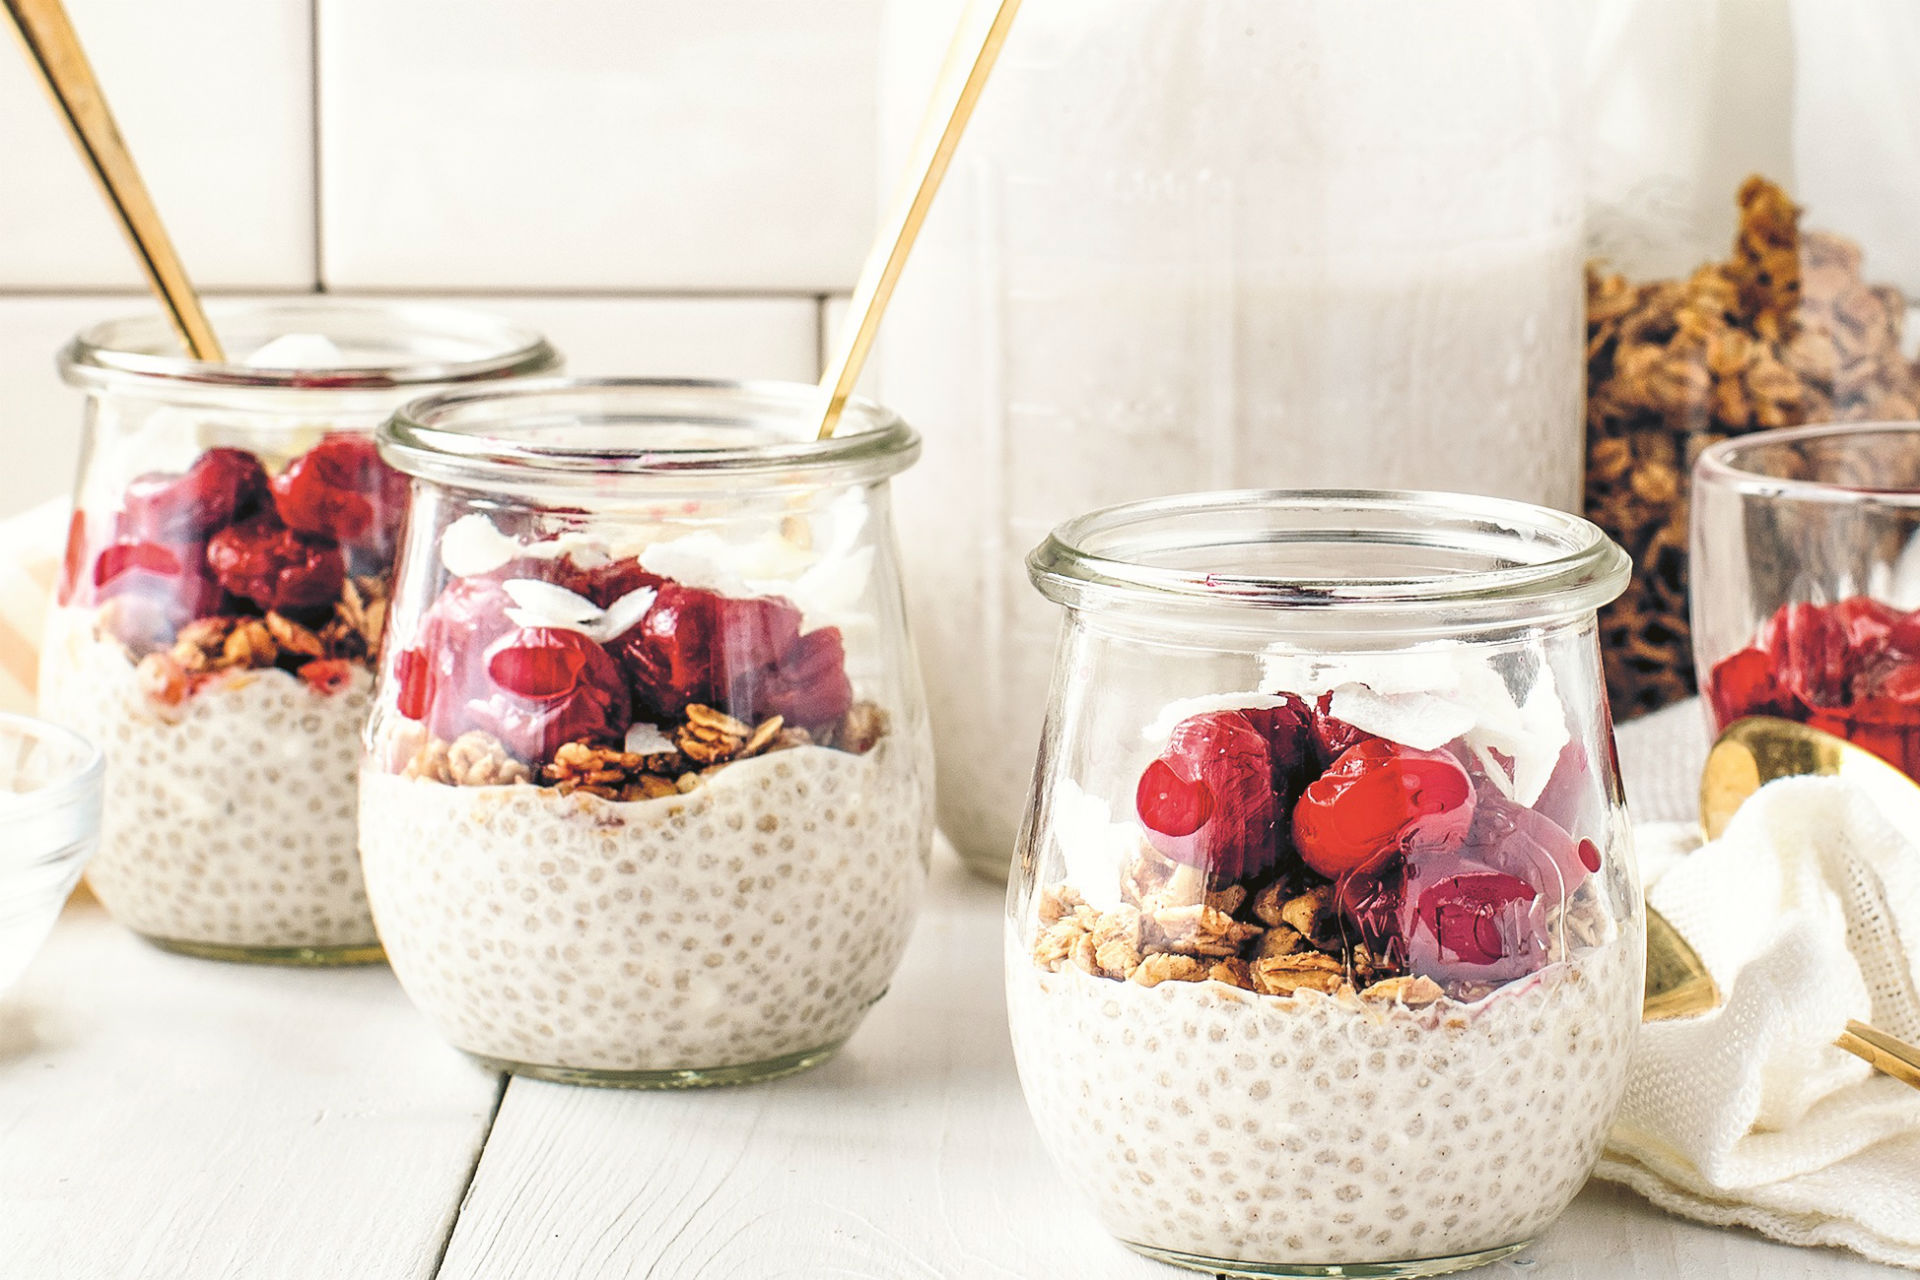 jars of parfait with cherries